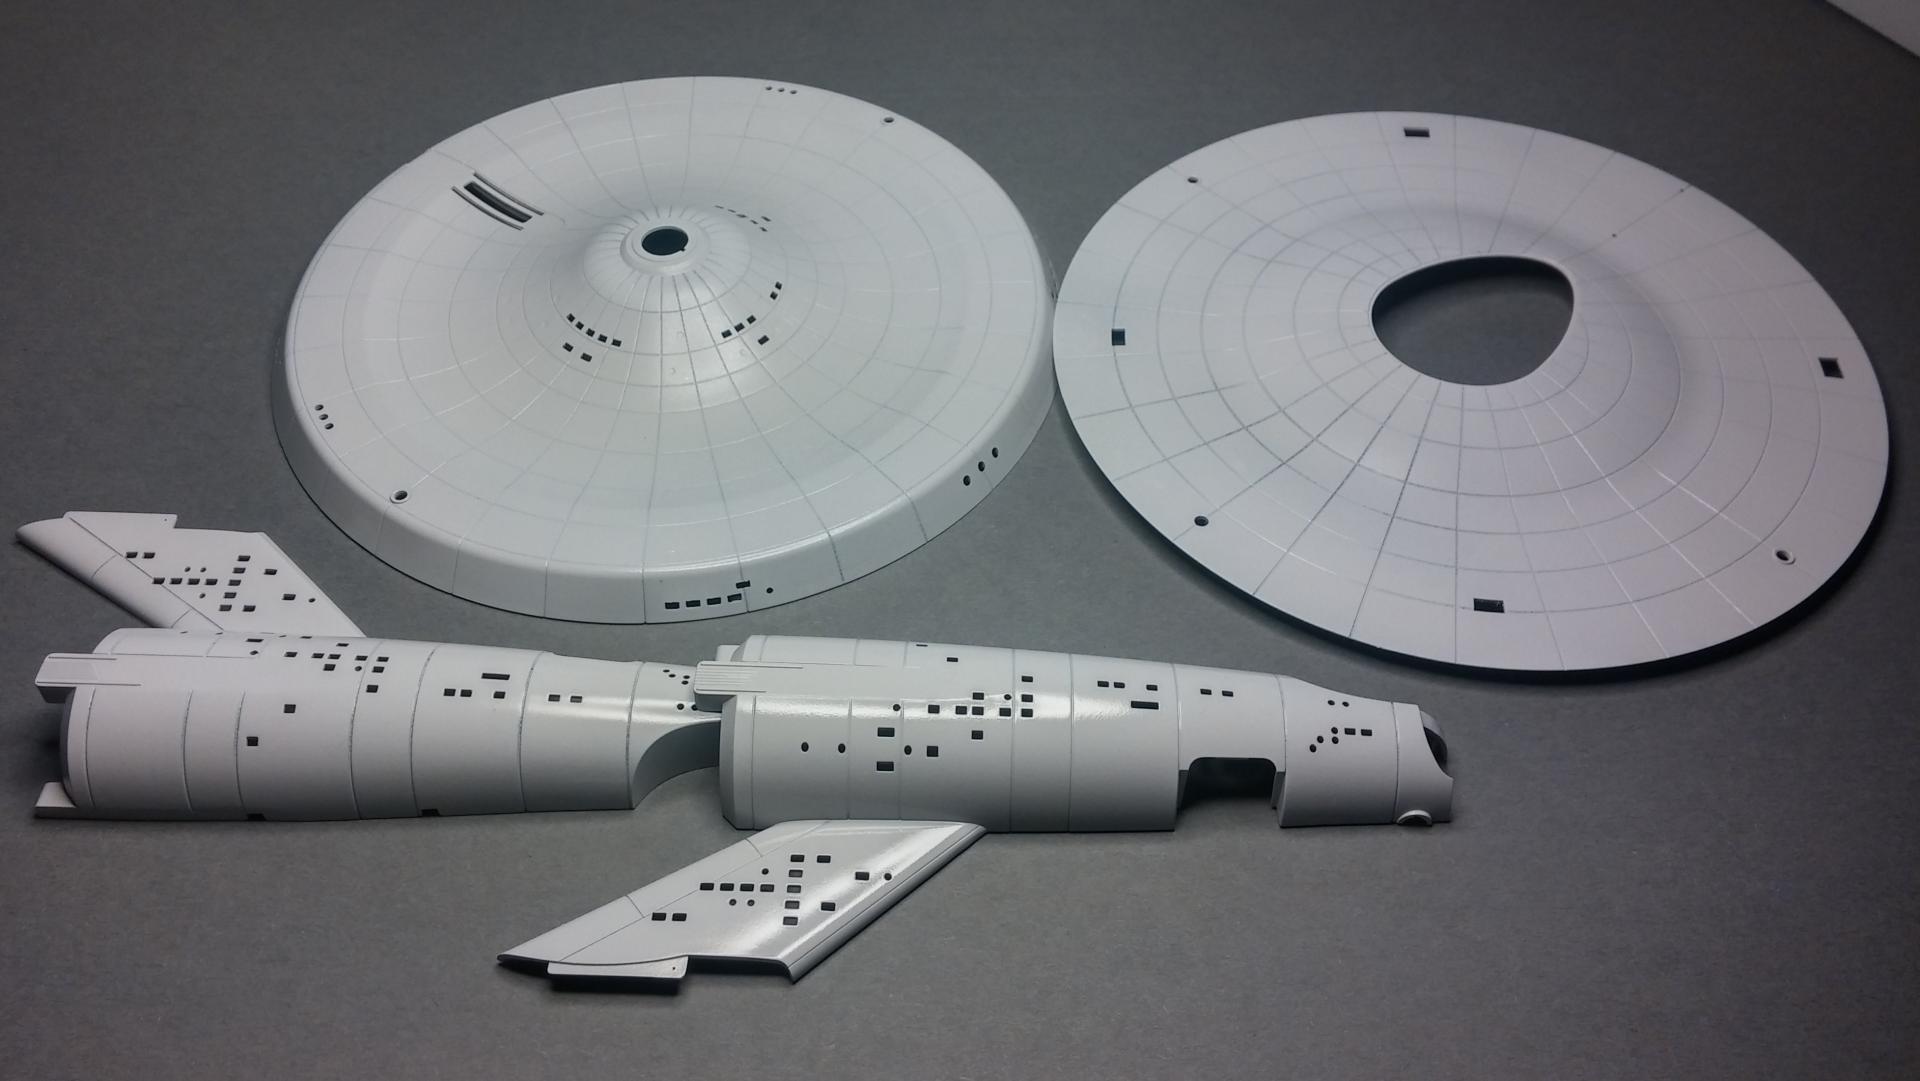 Starship_23.thumb.jpg.ba8d3784ae58ab01082cd5ac4a5b32e5.jpg